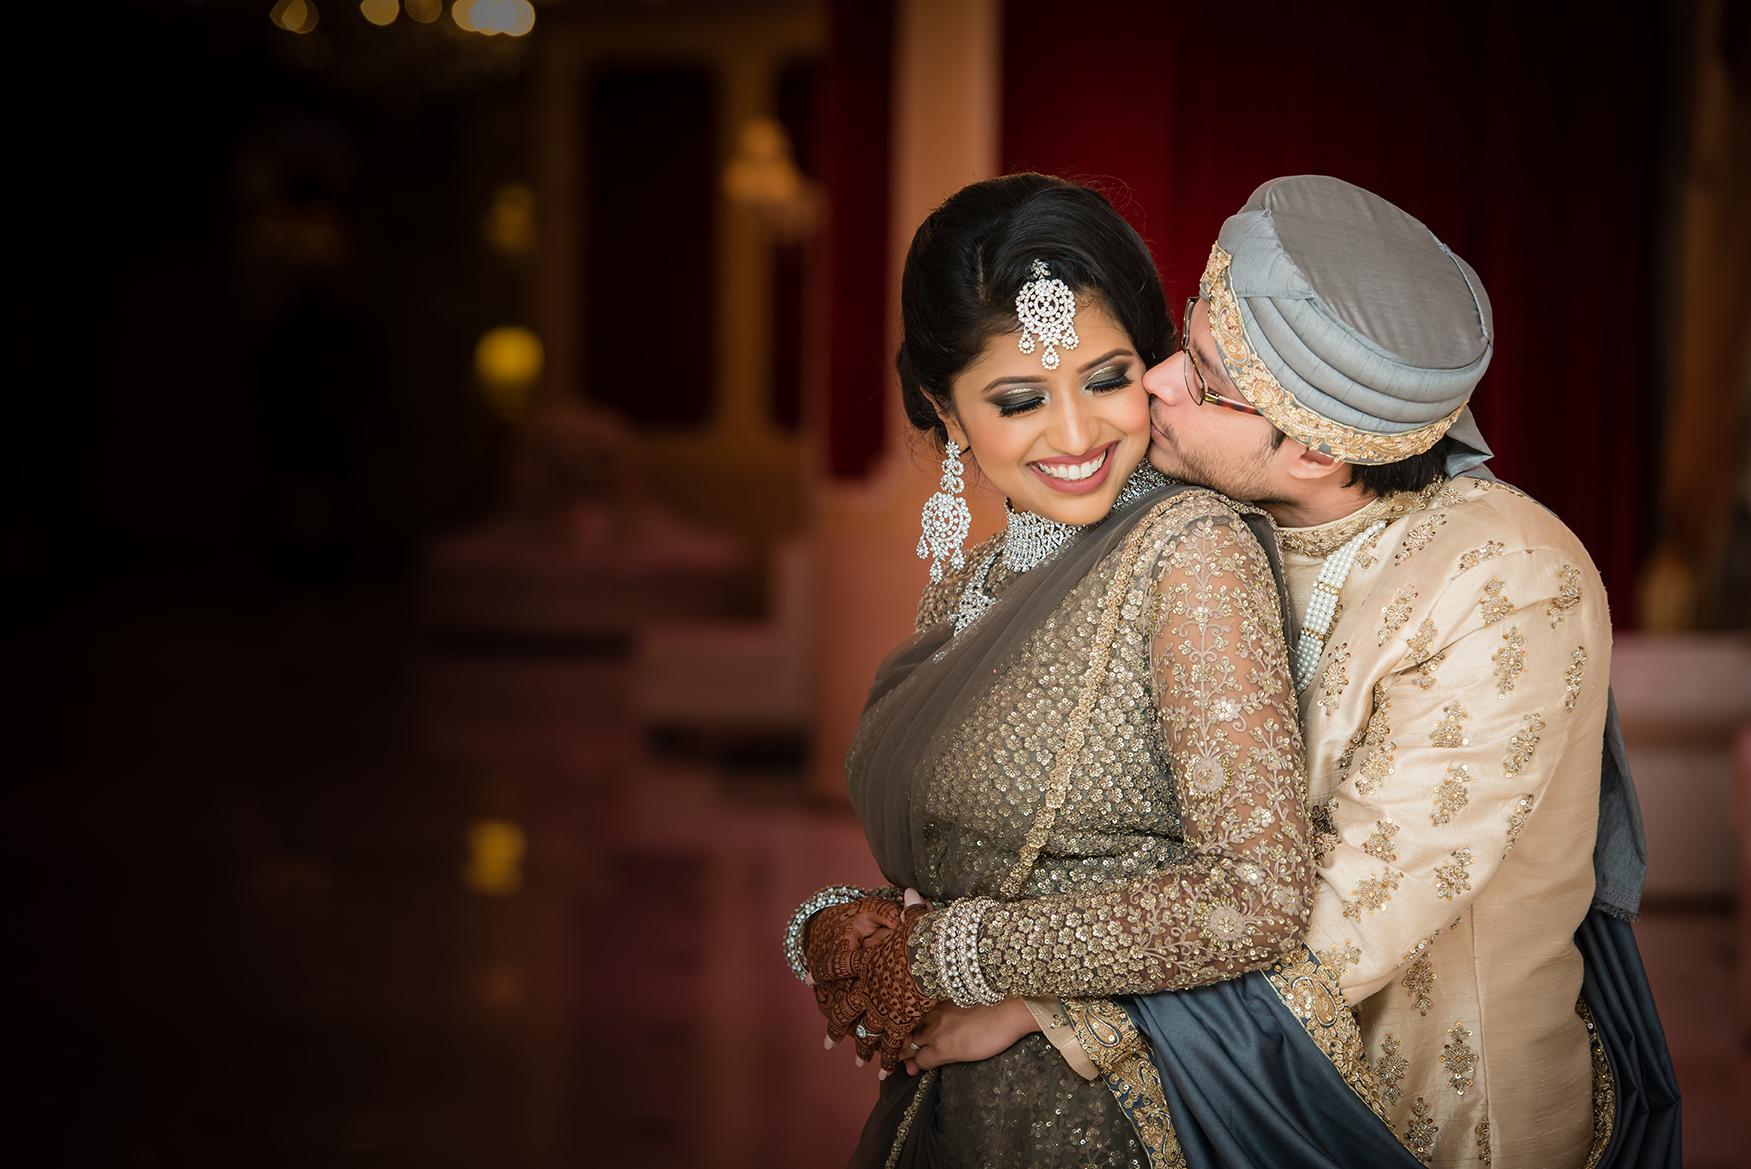 south_asian_wedding_photography_dhoom_studio_new_york24 SOUTH ASIAN WEDDINGS